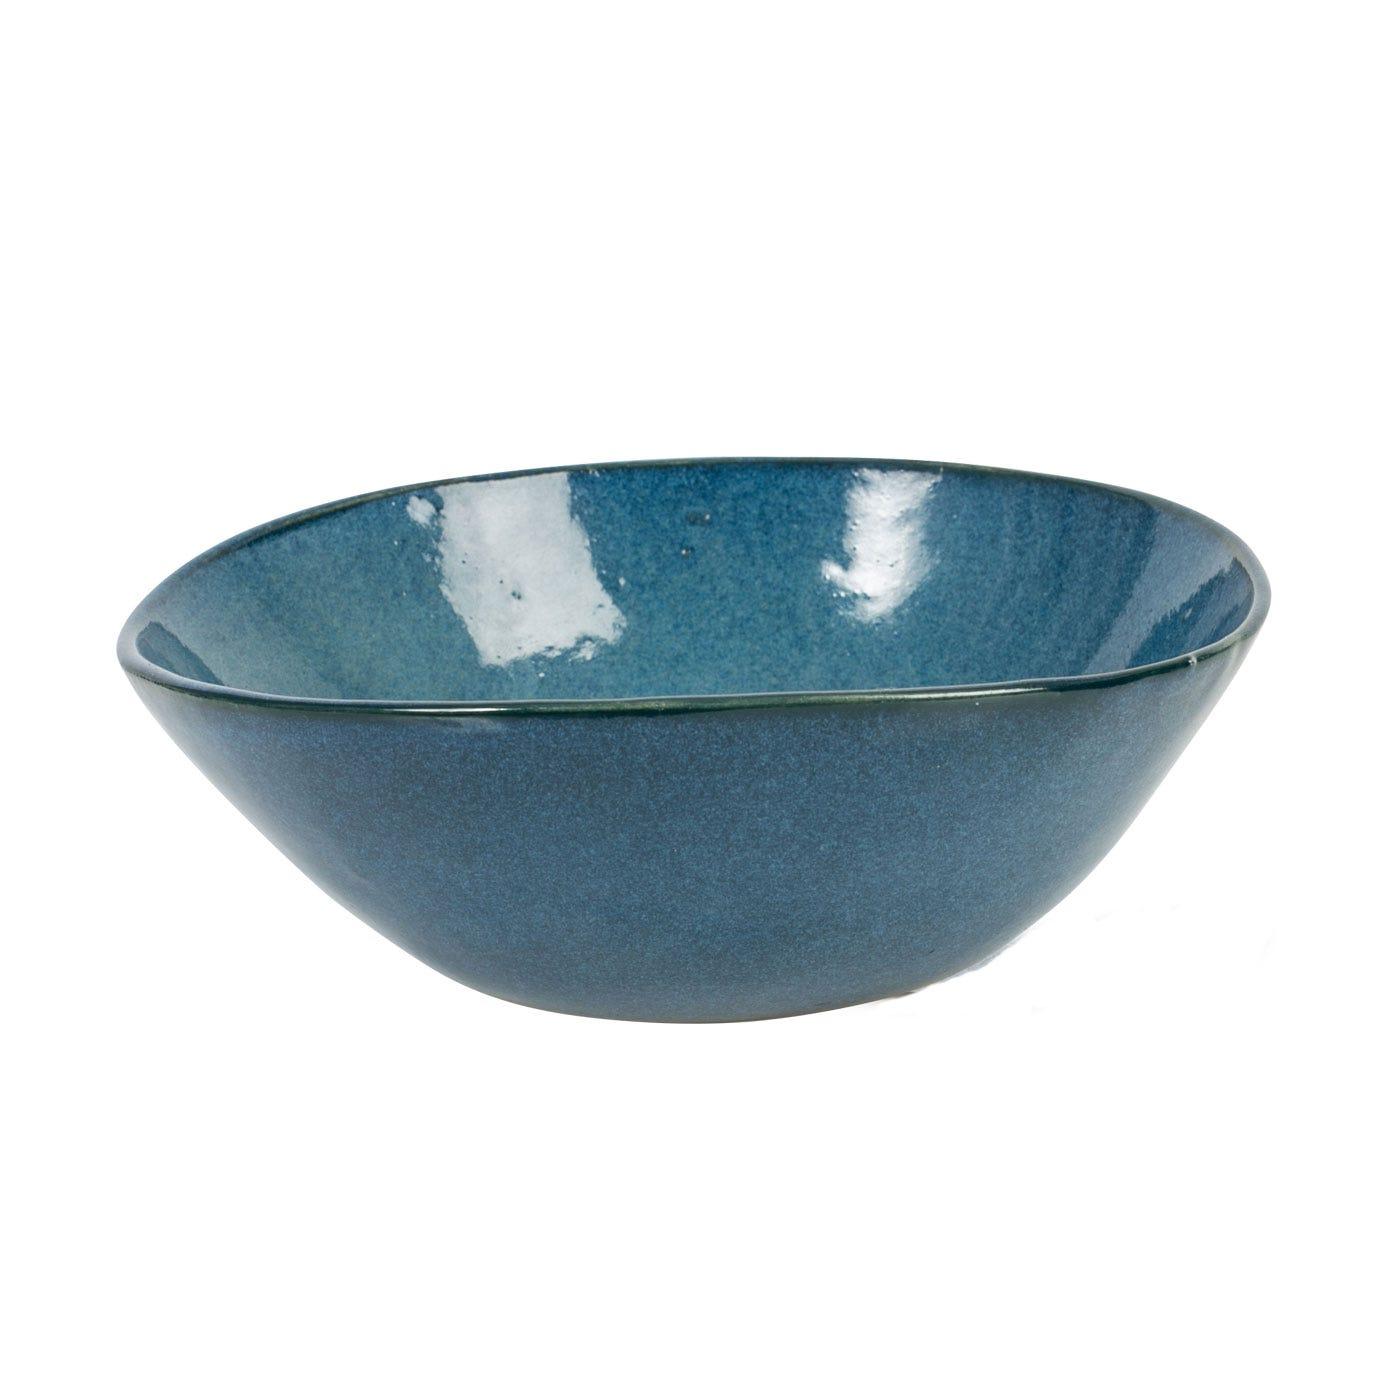 Medium Bowl Teal